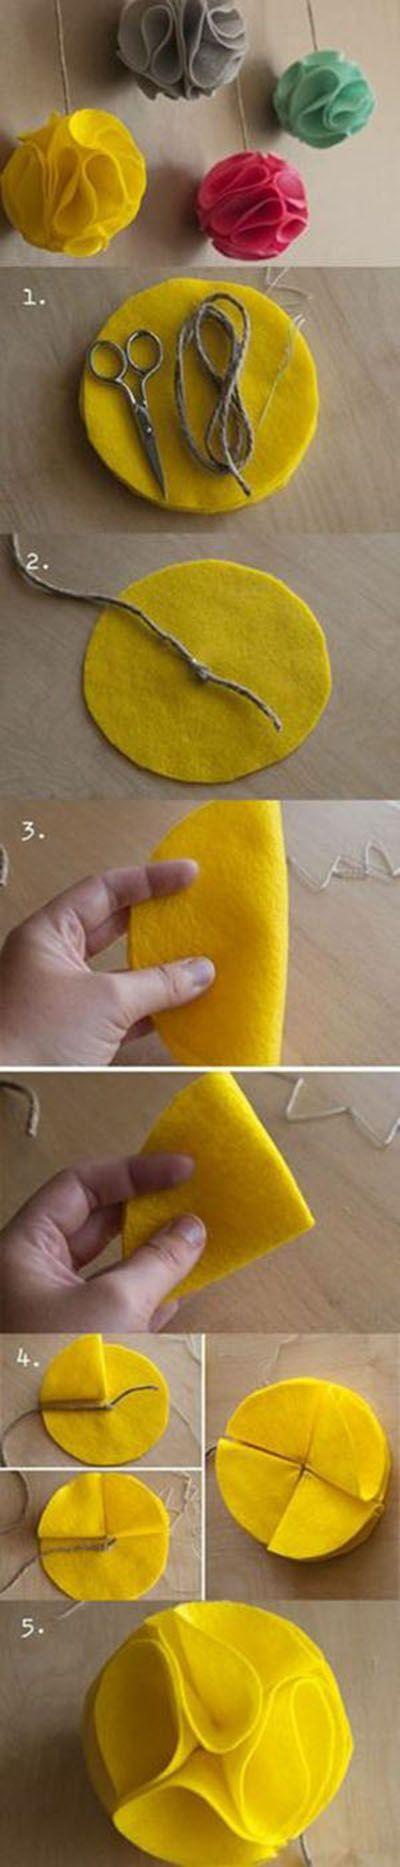 22 Easy DIY Craft Tutorials Part 3   Inspired Snaps